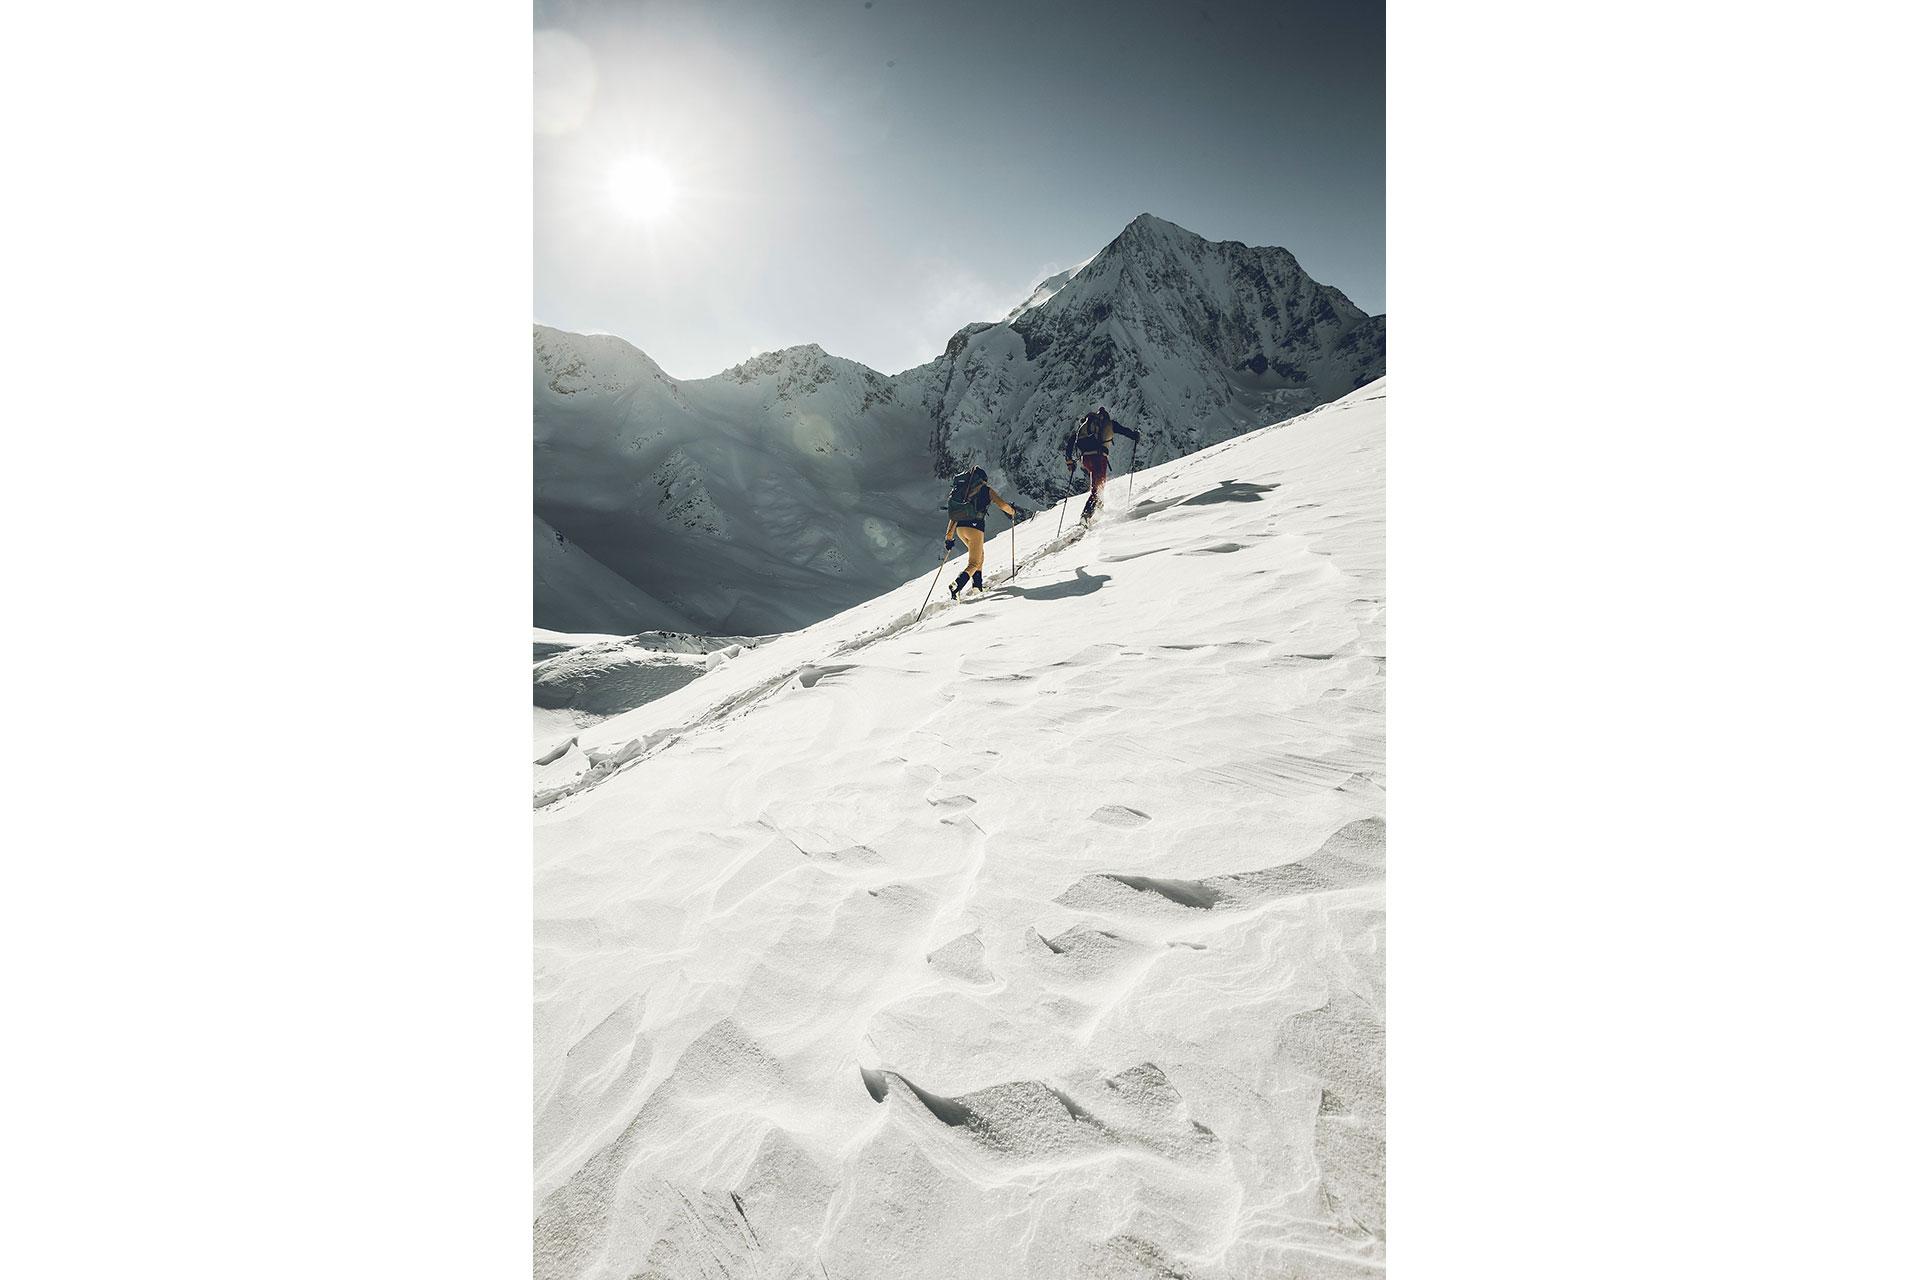 Winter Alpin Landschaft Fotoproduktion Skitour Fotograf Michael Müller London England